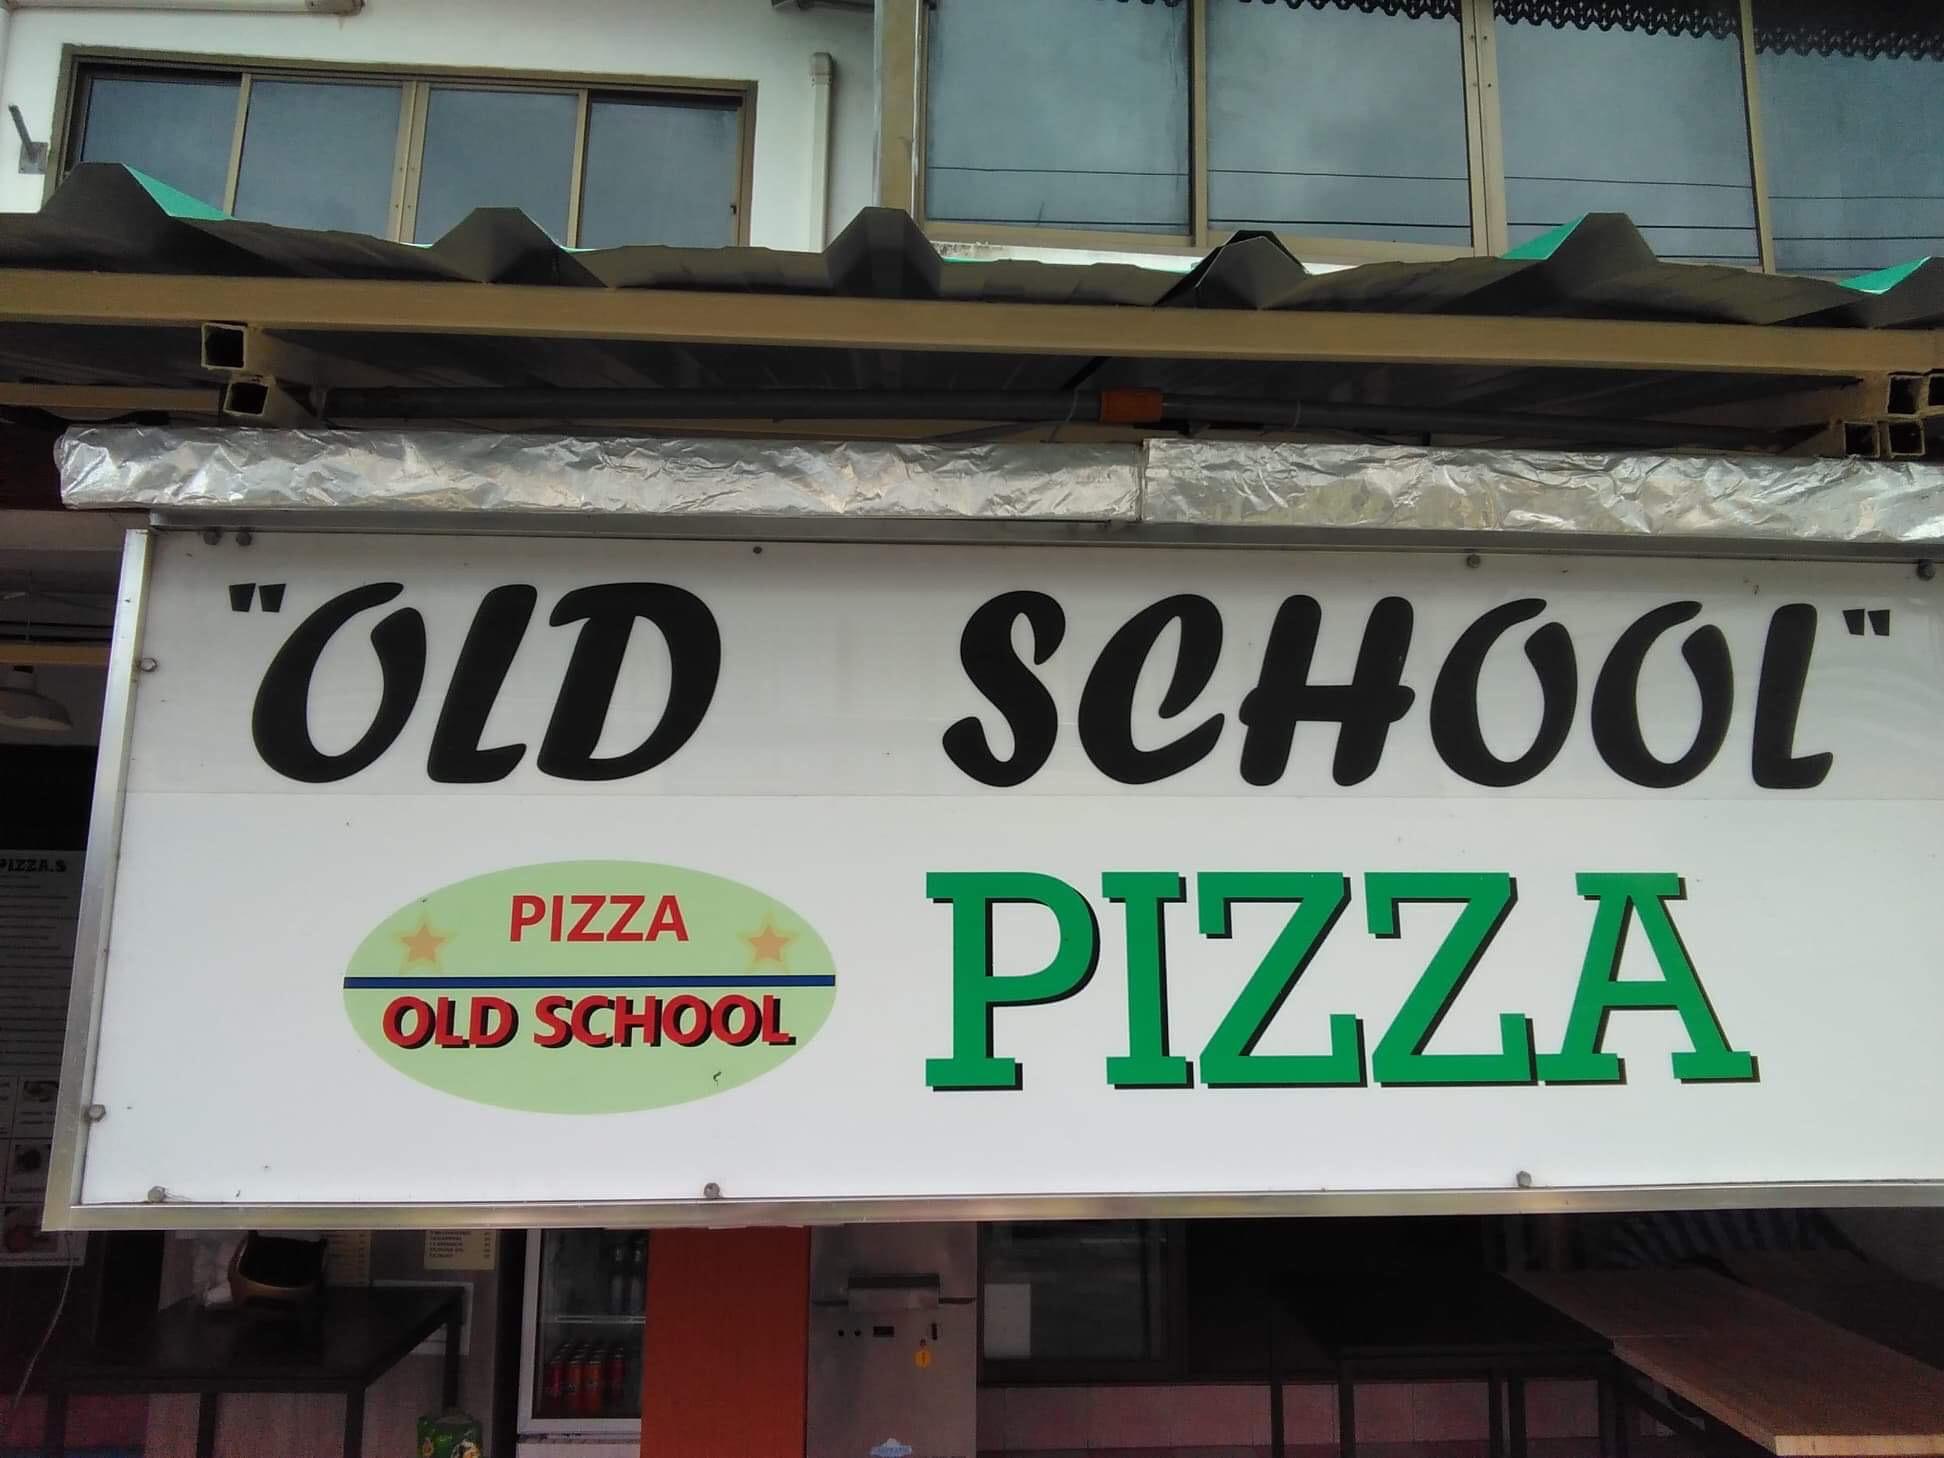 Pizza Wolfi.s